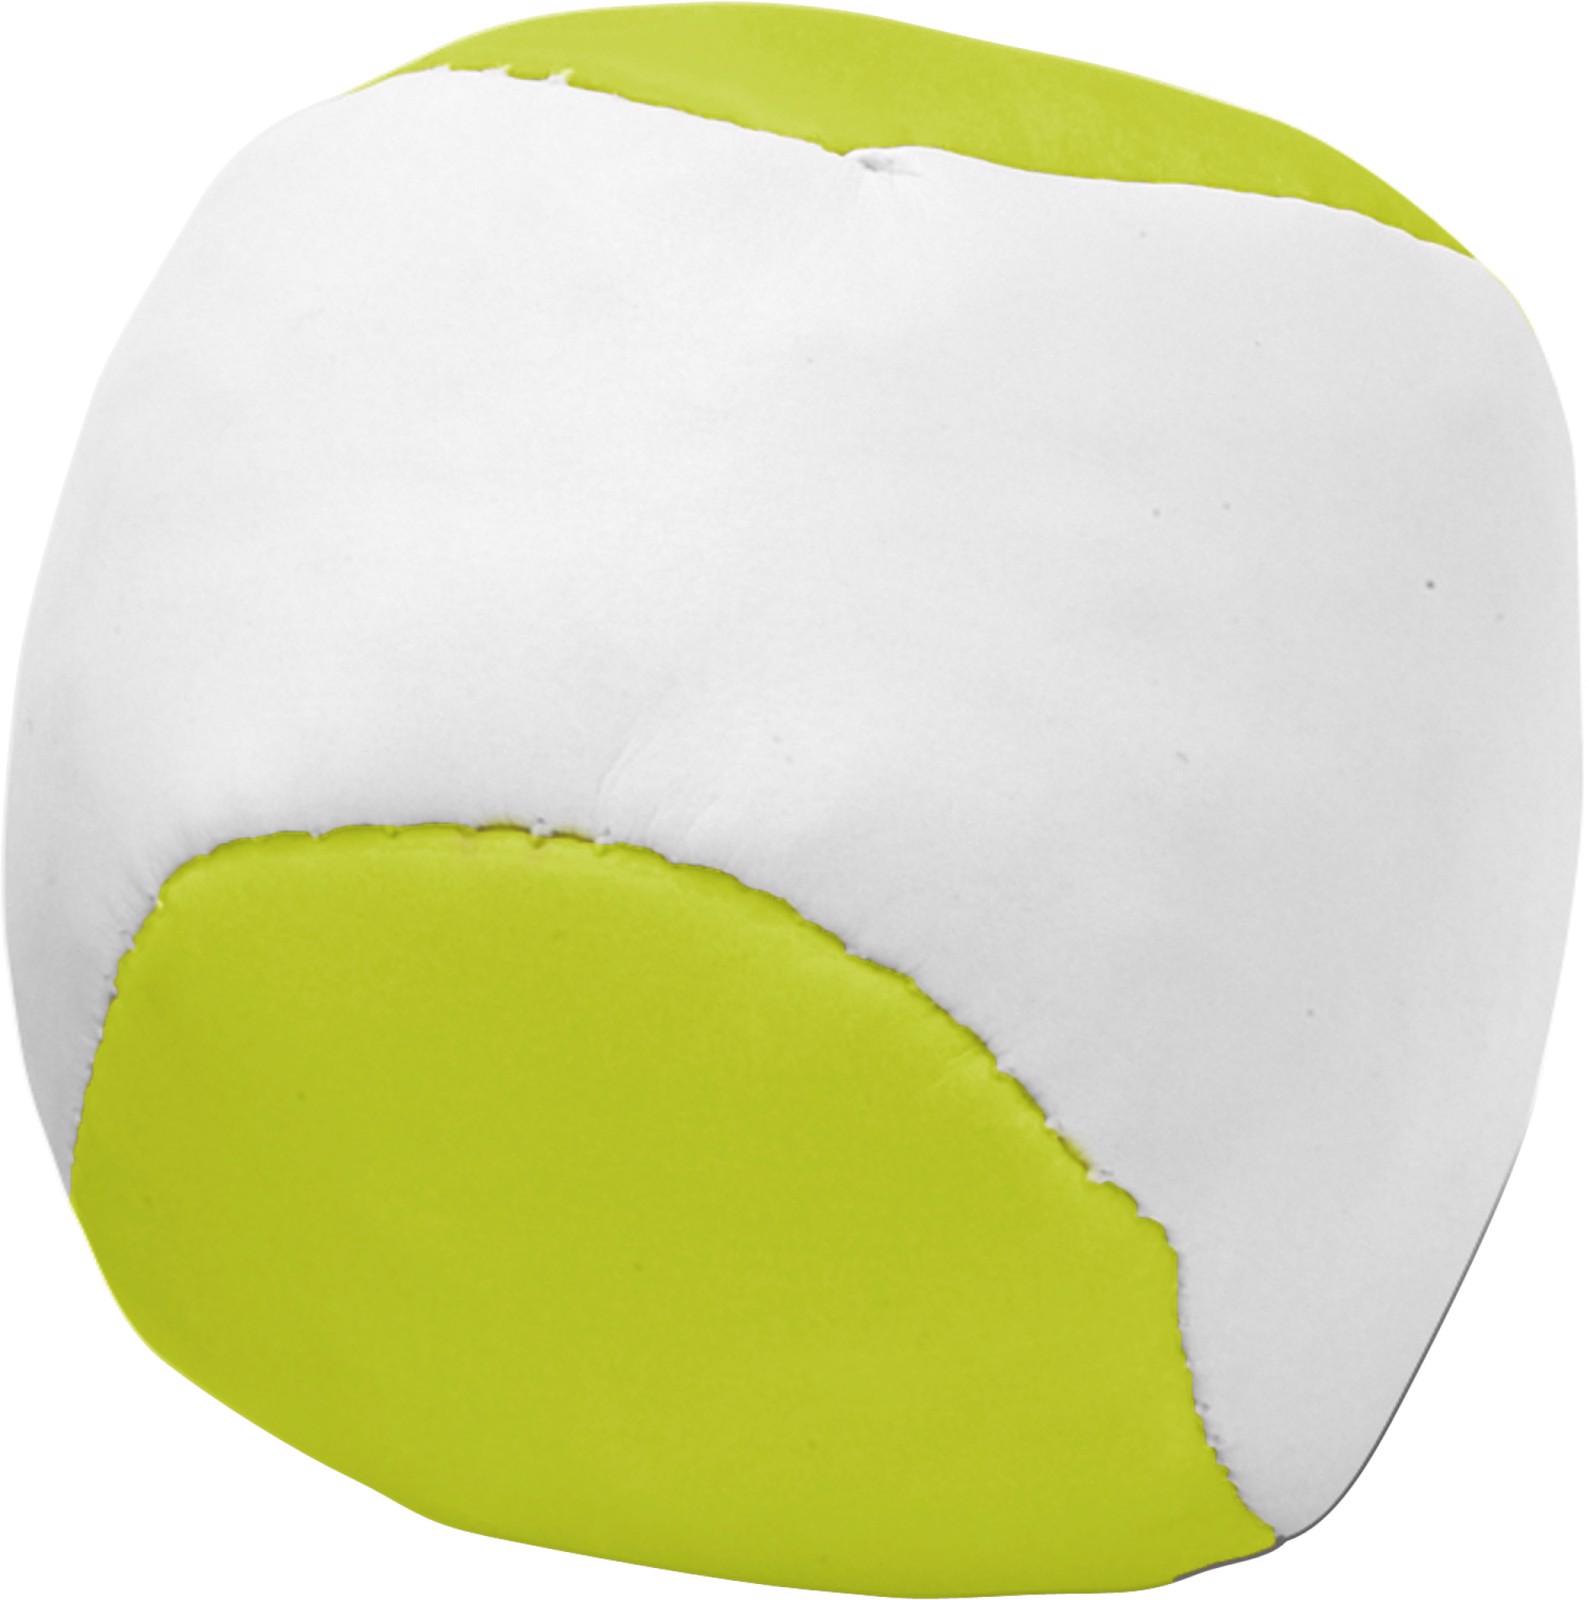 Imitation leather juggling ball - Lime